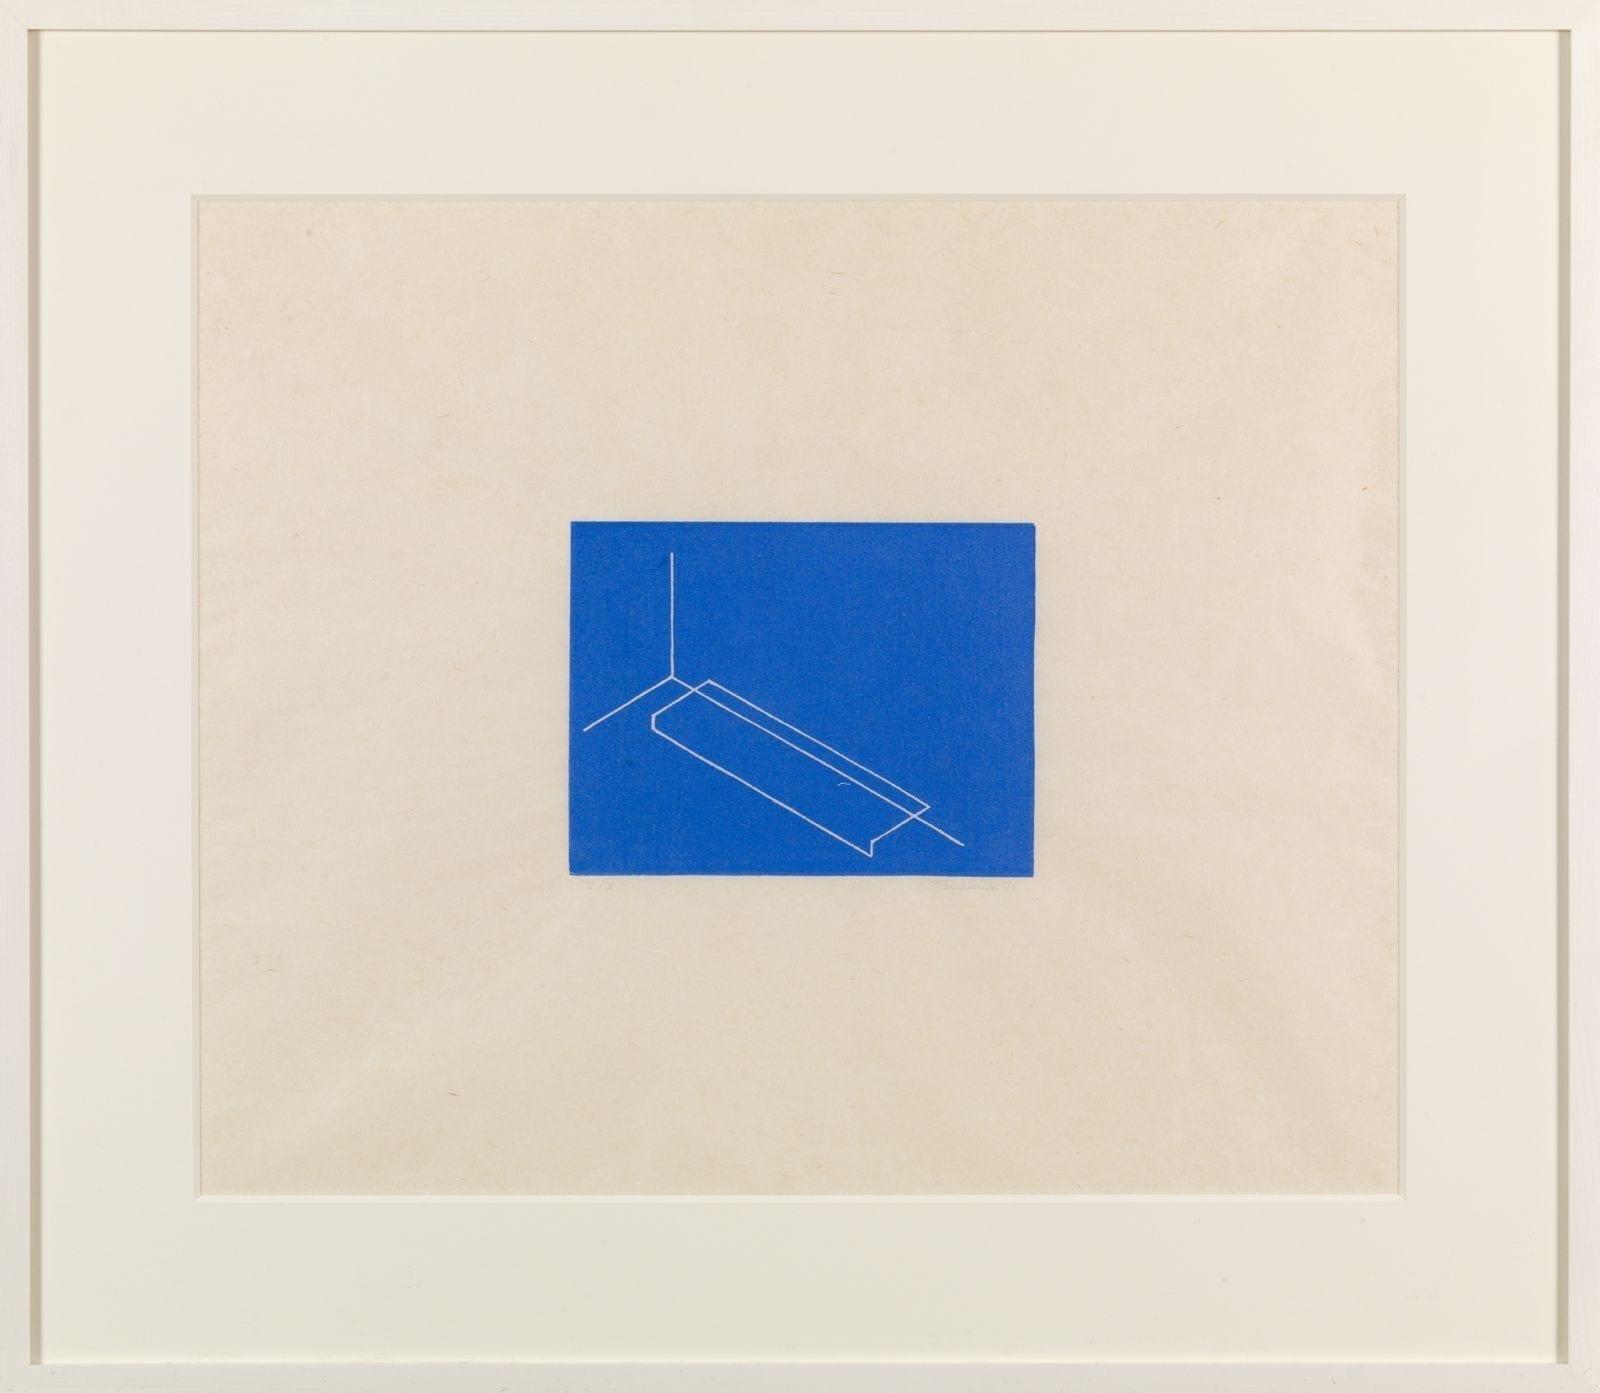 Untitled 1975 Medium: Linocut